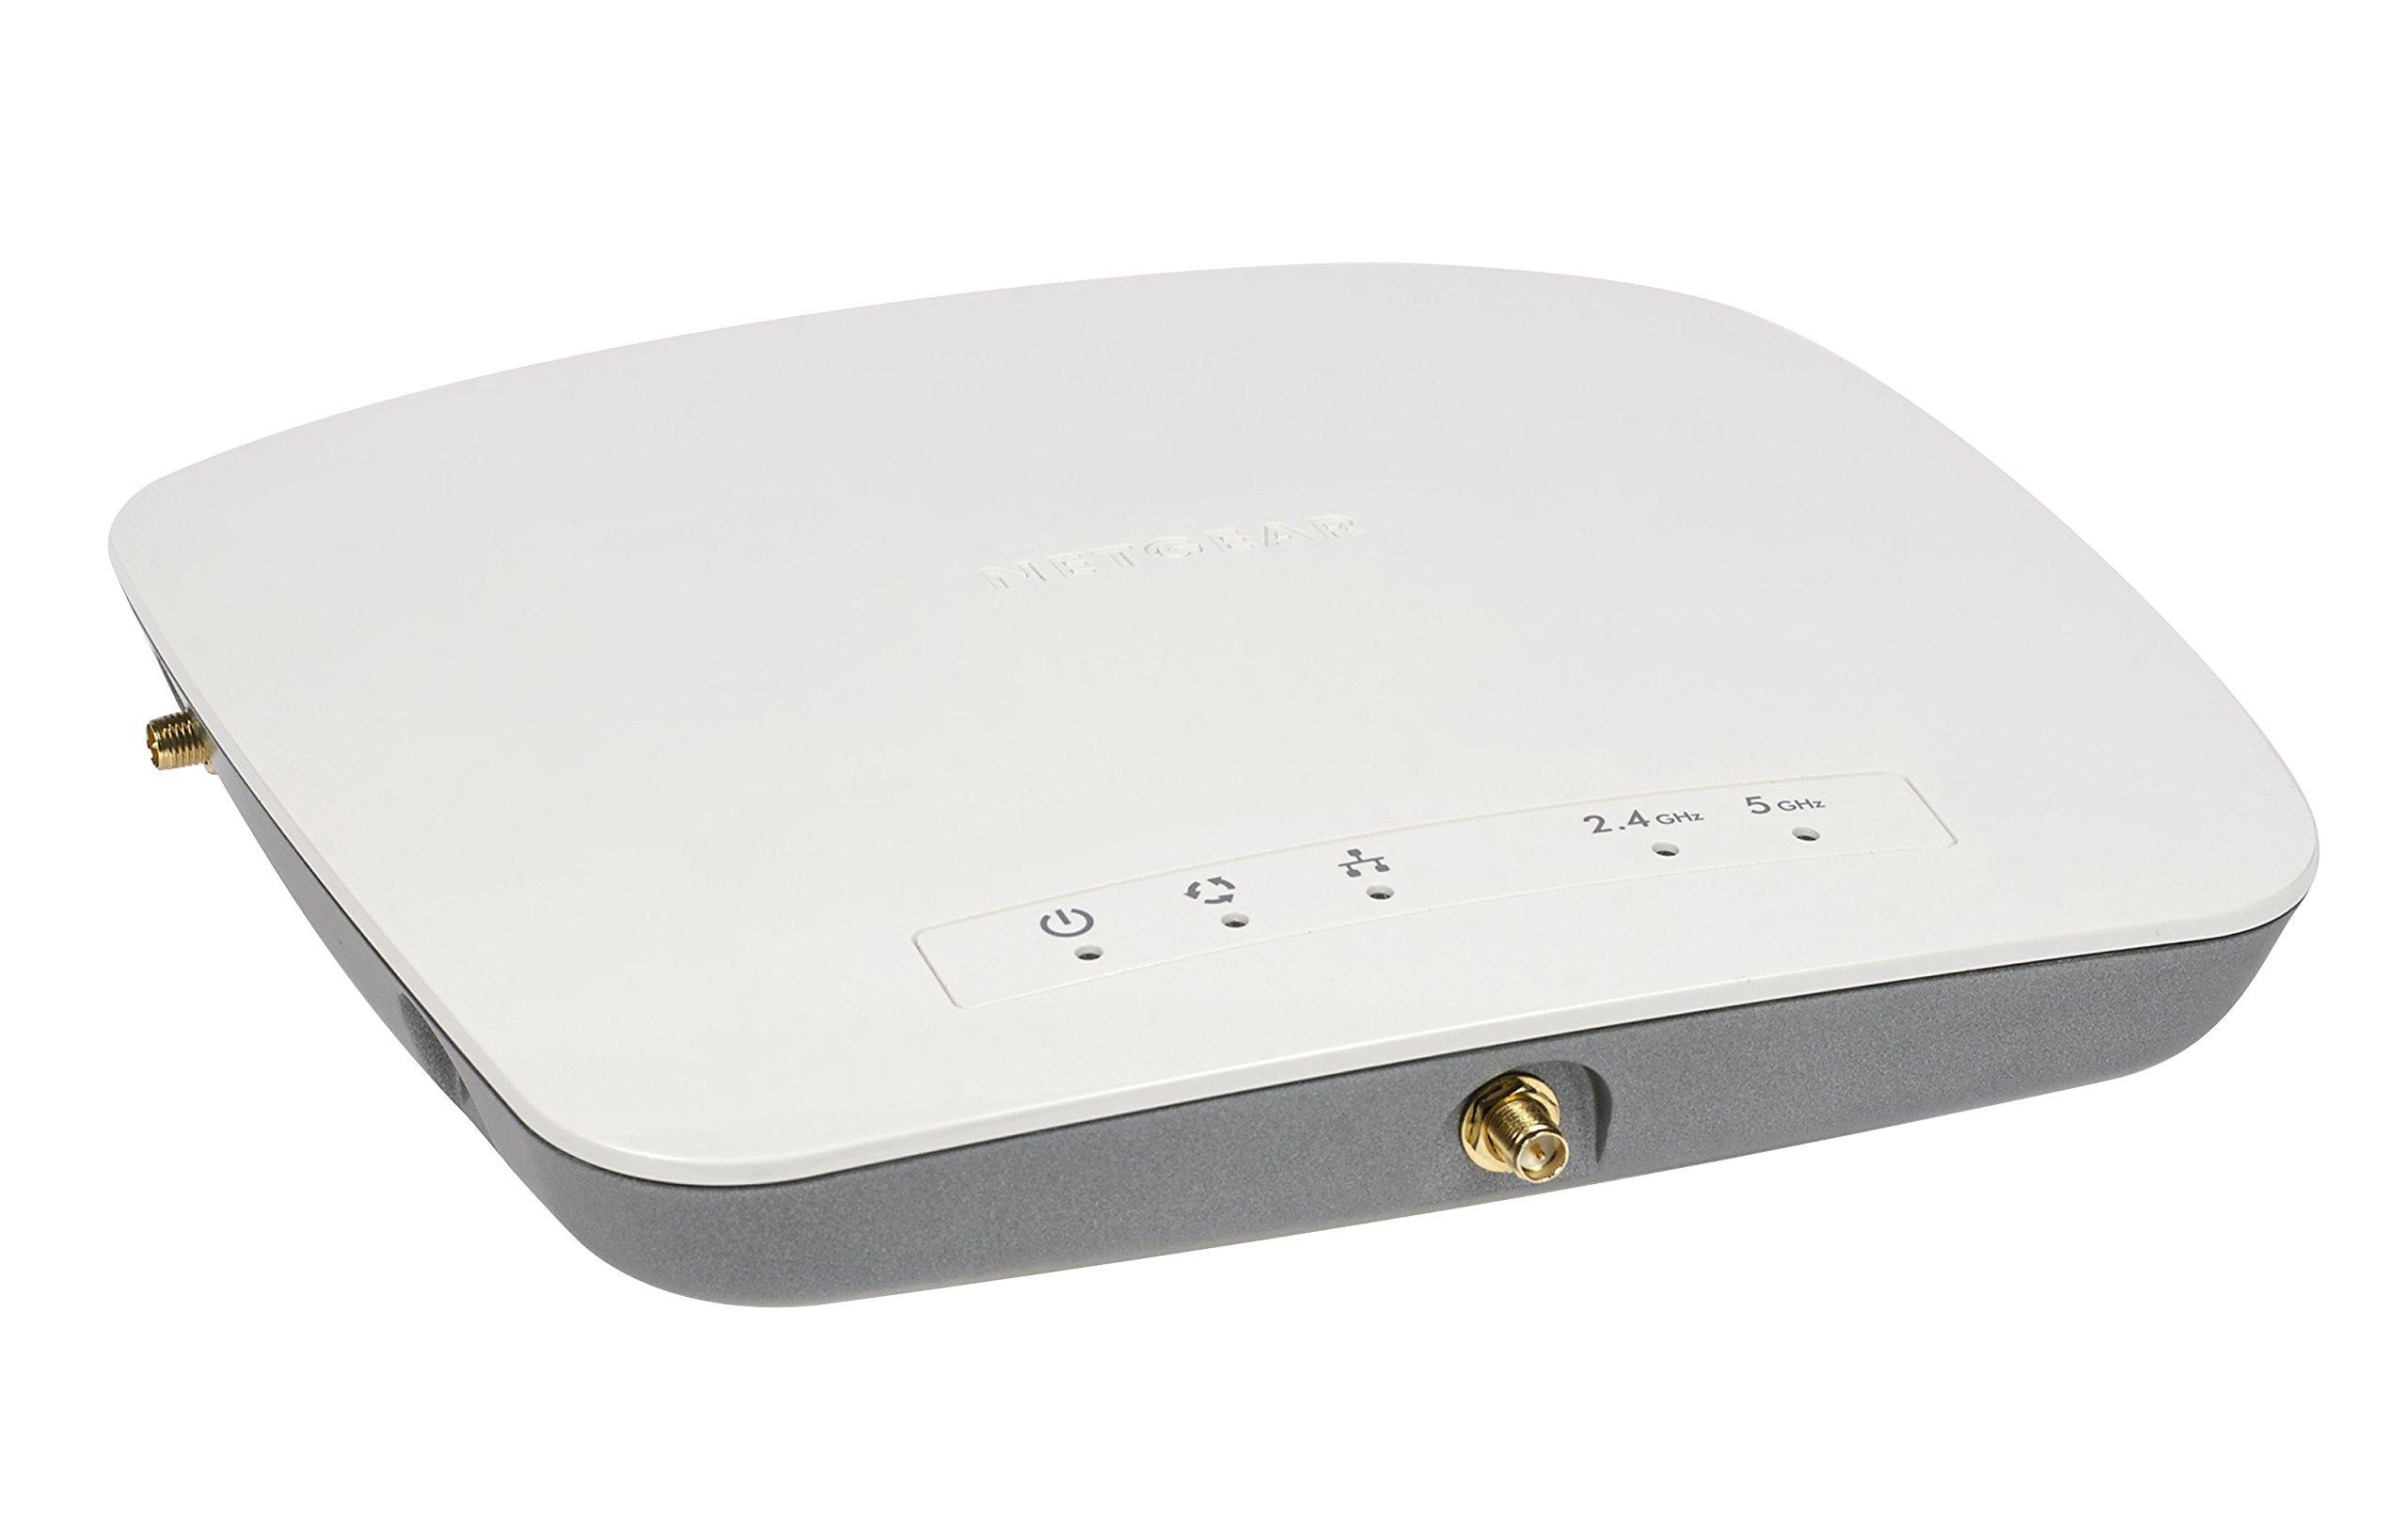 NETGEAR AC1750 Wireless Access Point | Dual Band, 3x3 WiFi | Web Managed | WAC730 by NETGEAR